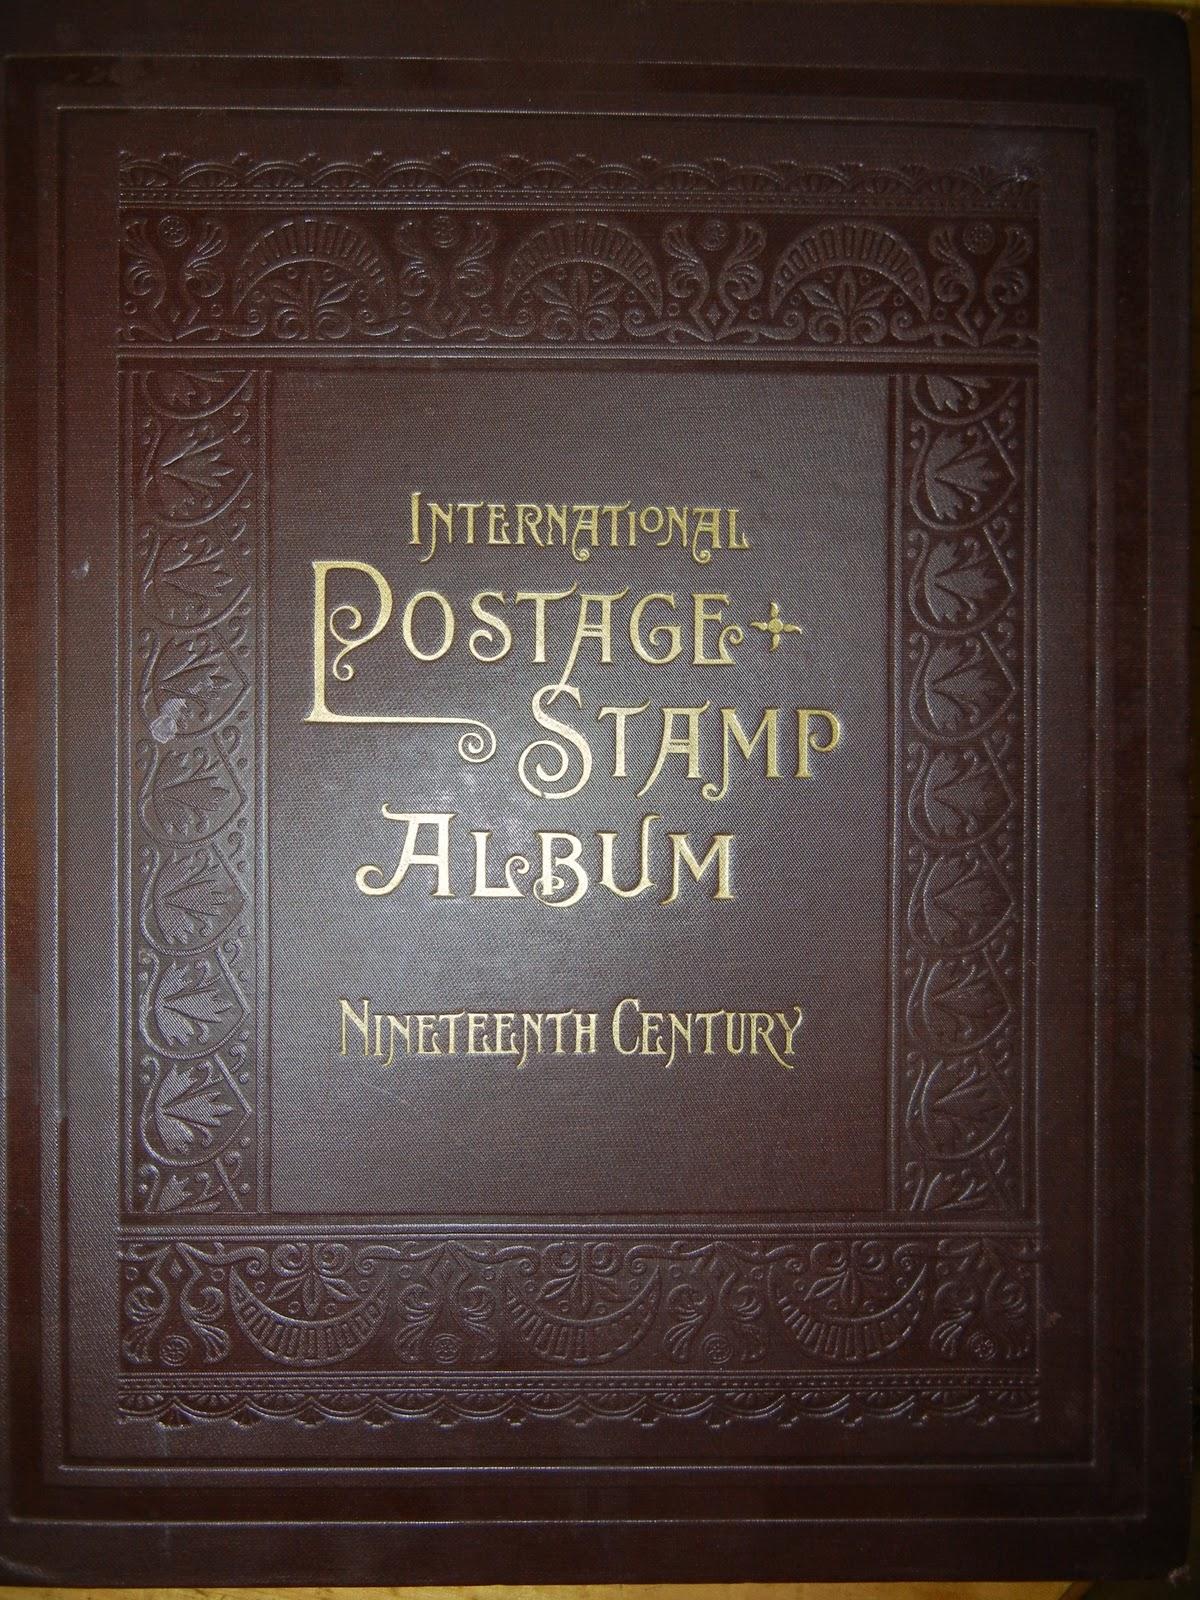 Scott International Postage Stamp Album for Nineteenth Century stamps